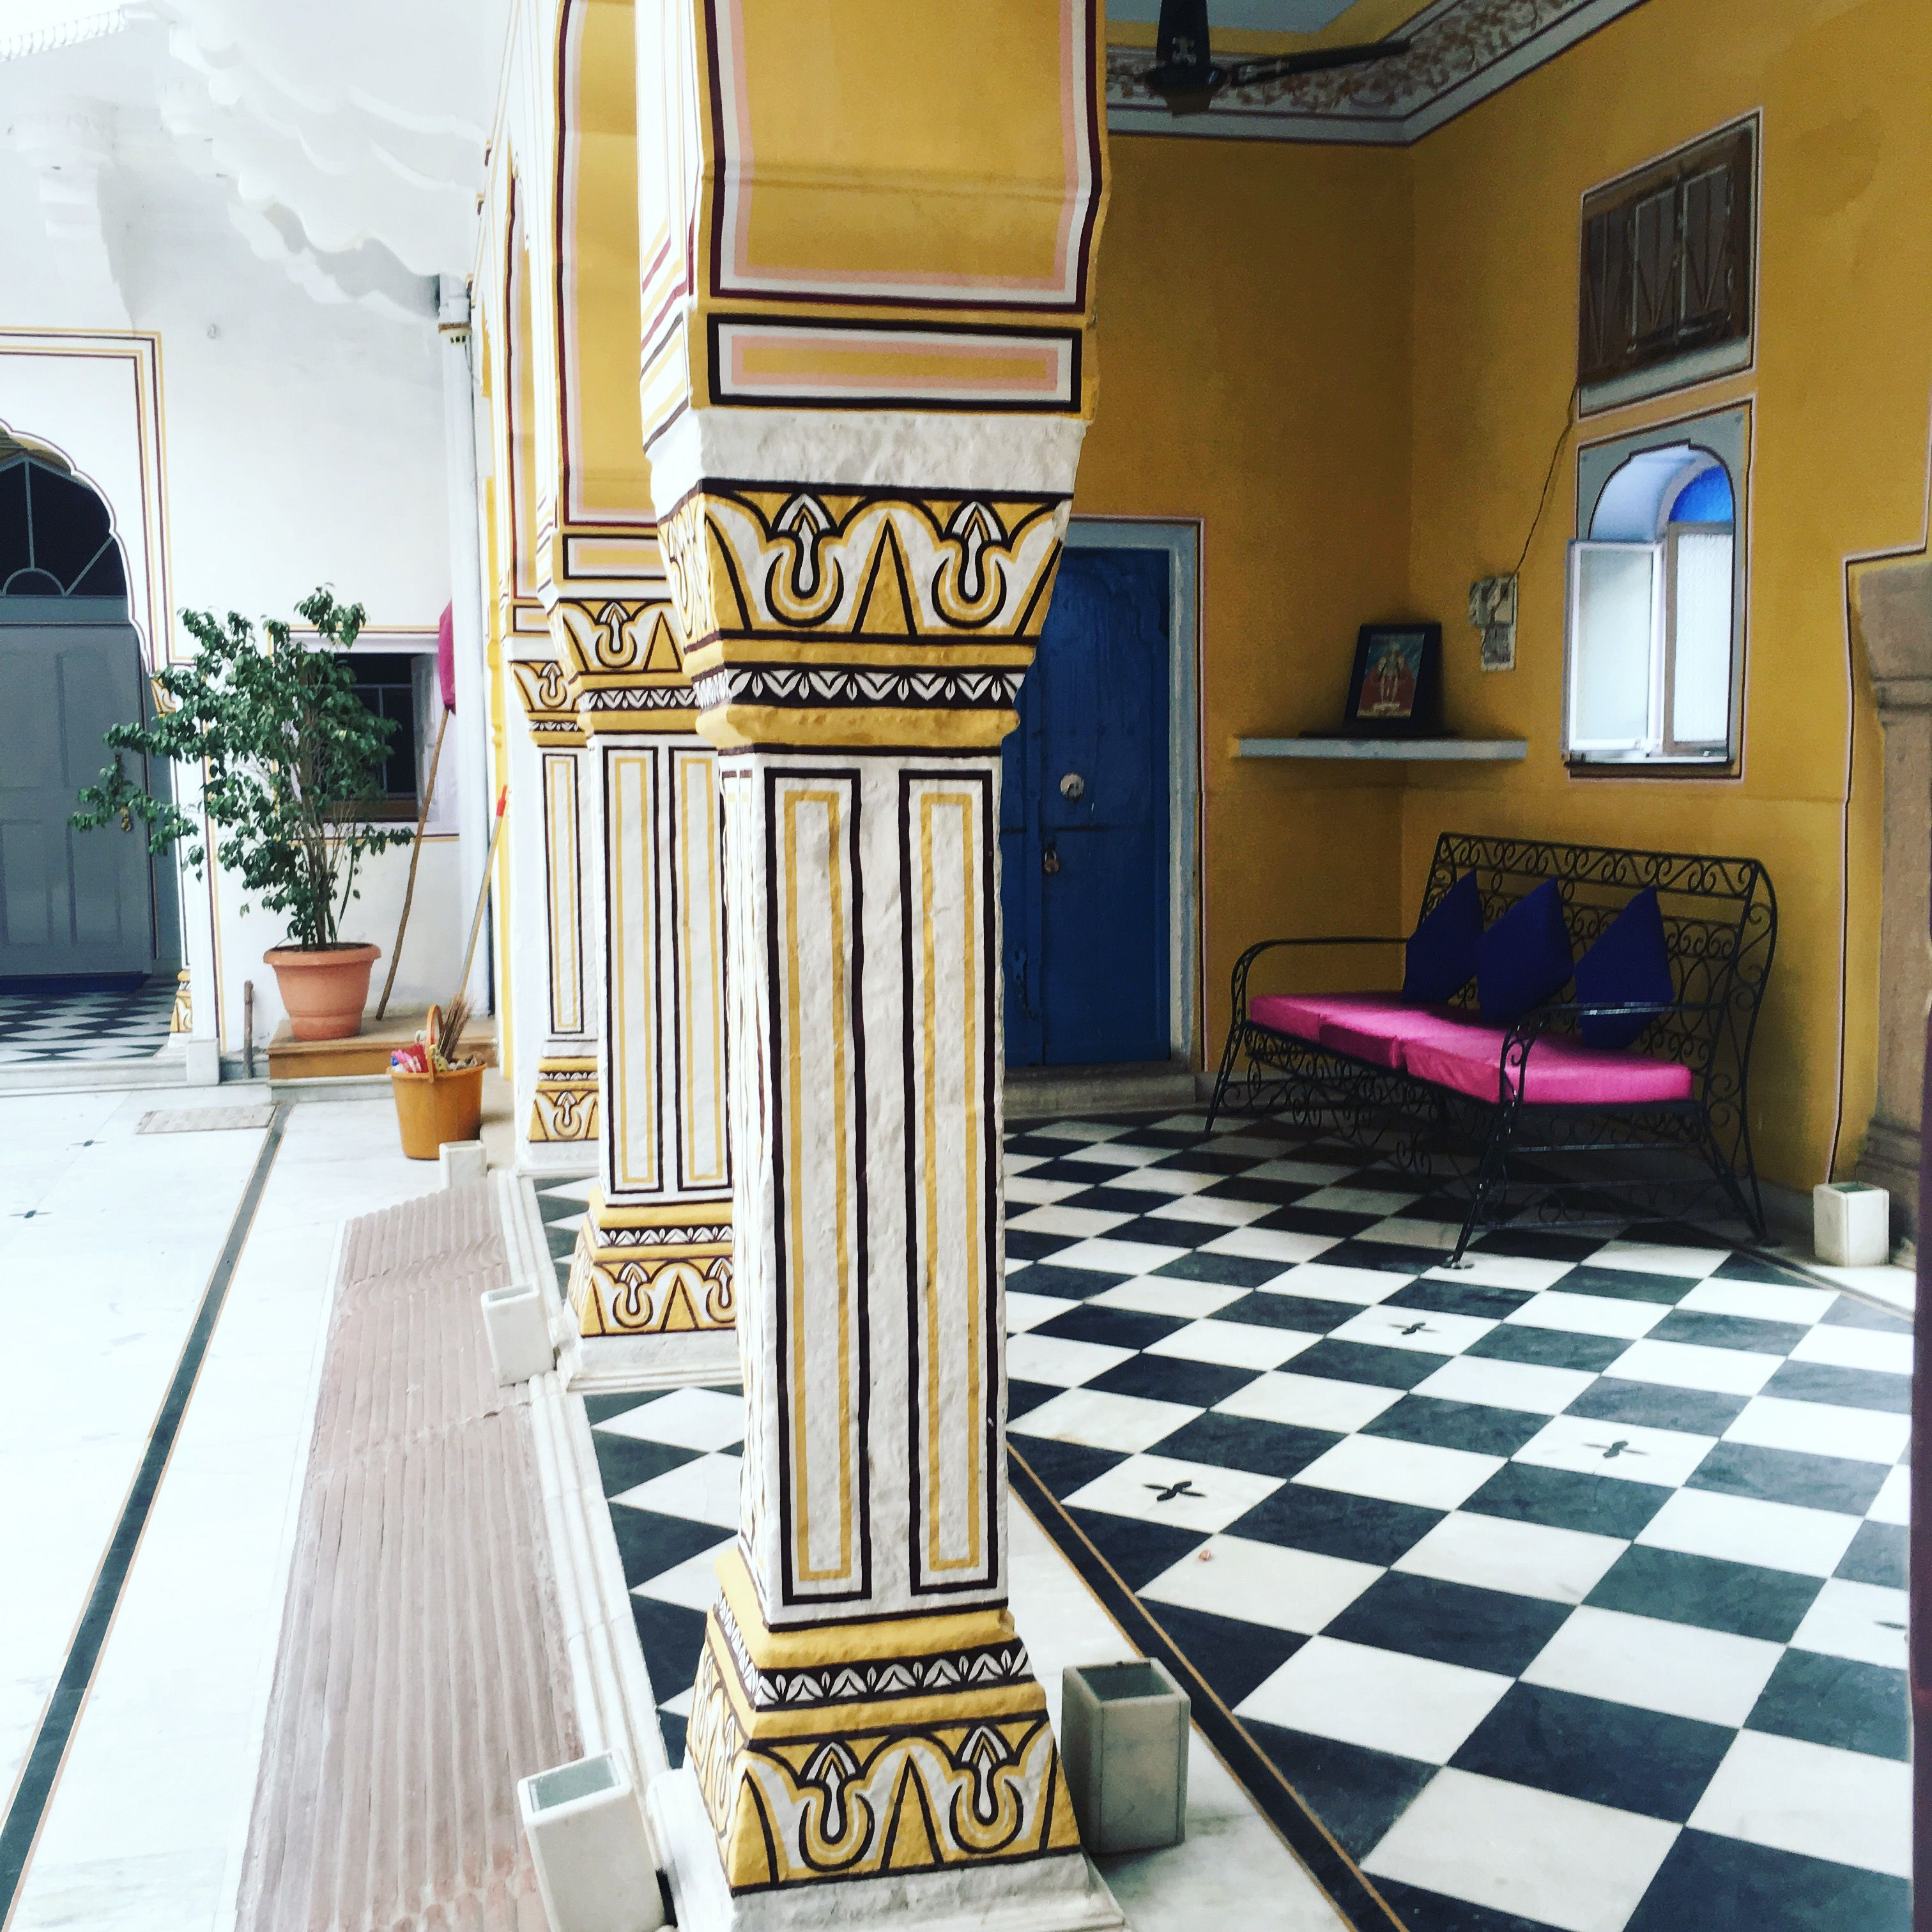 diggi palace jaipur haveli heritage hotel interiors inspiration traditional architecture indian inspired decor - Traditional Hotel Interior